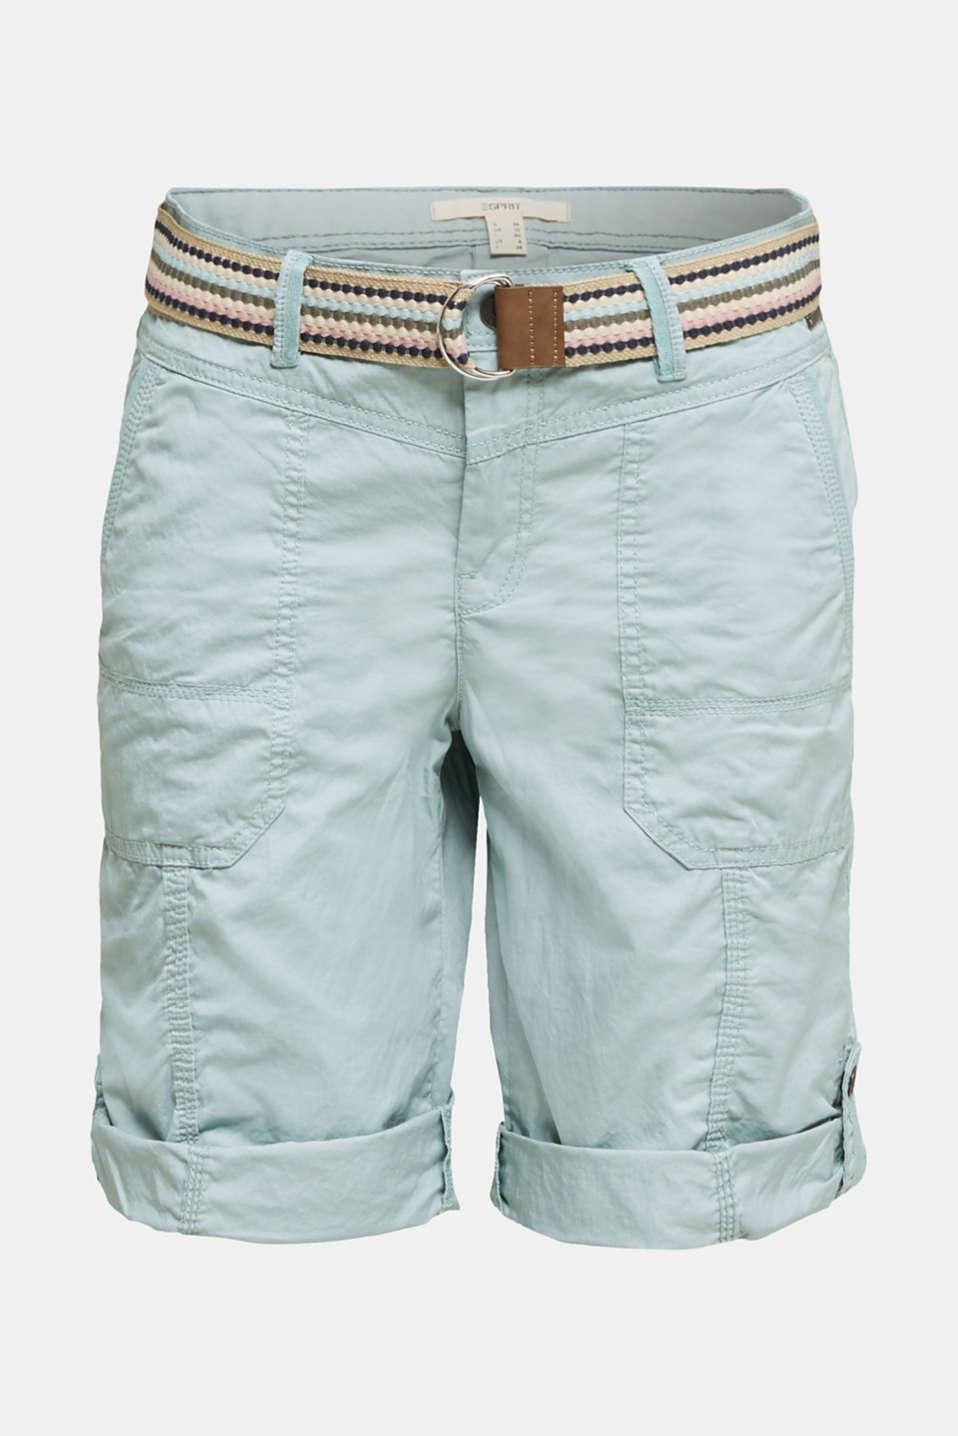 PLAY cotton shorts, LIGHT AQUA GREEN, detail image number 7